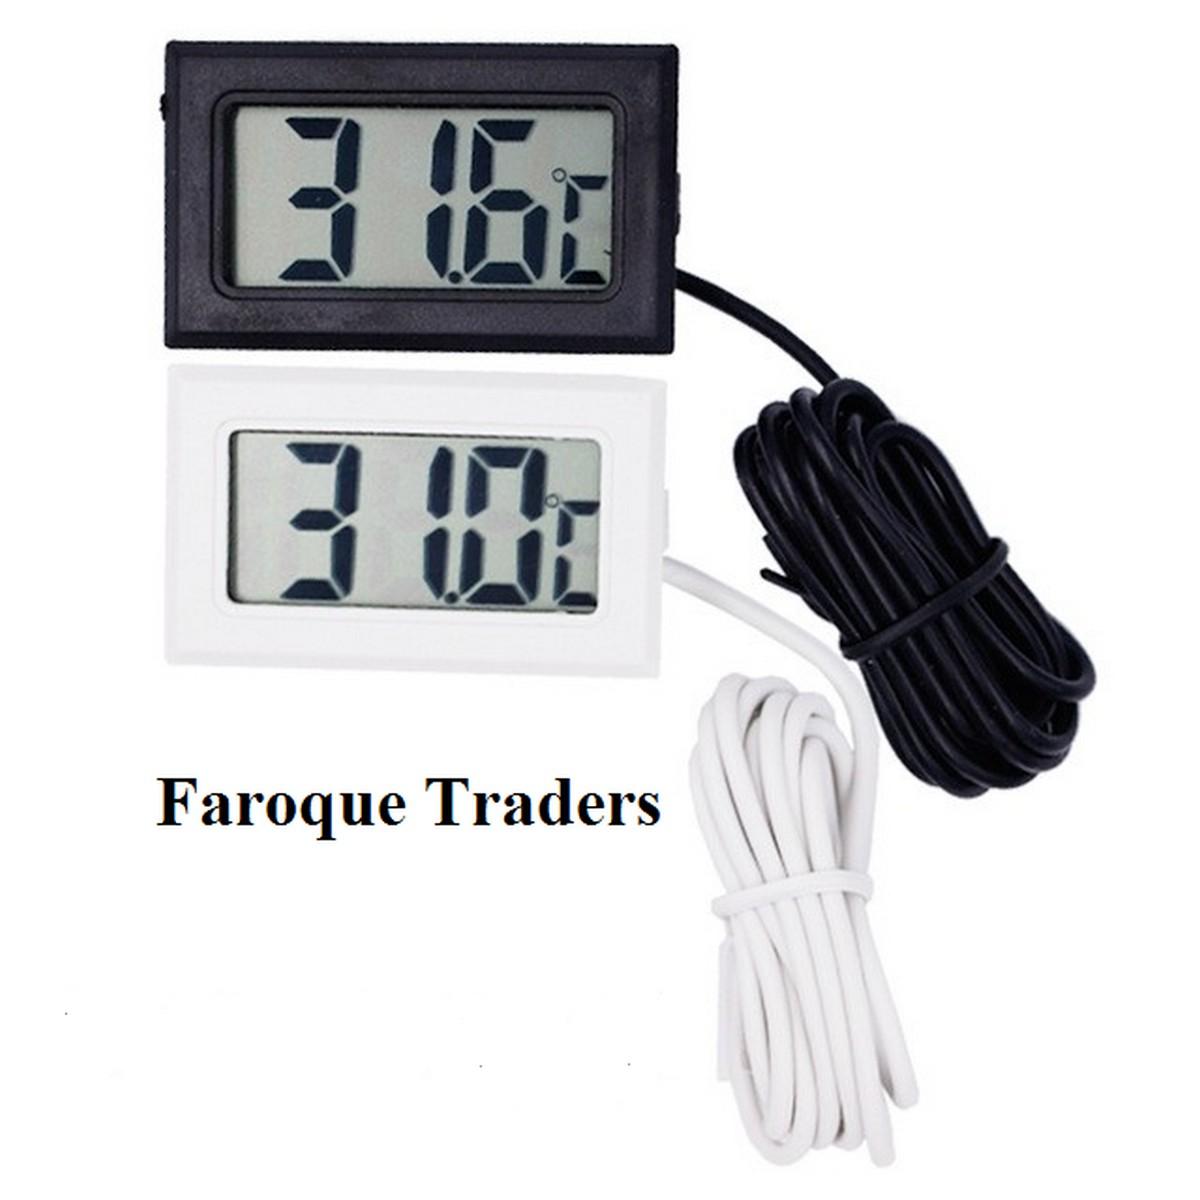 TPM10 Mini LCD Digital Instant Read Thermometer Mini Room Temperature Meter Real Time Aquarium Fish Tank Temperature Meter With Waterproof Sensor In Black/White Color